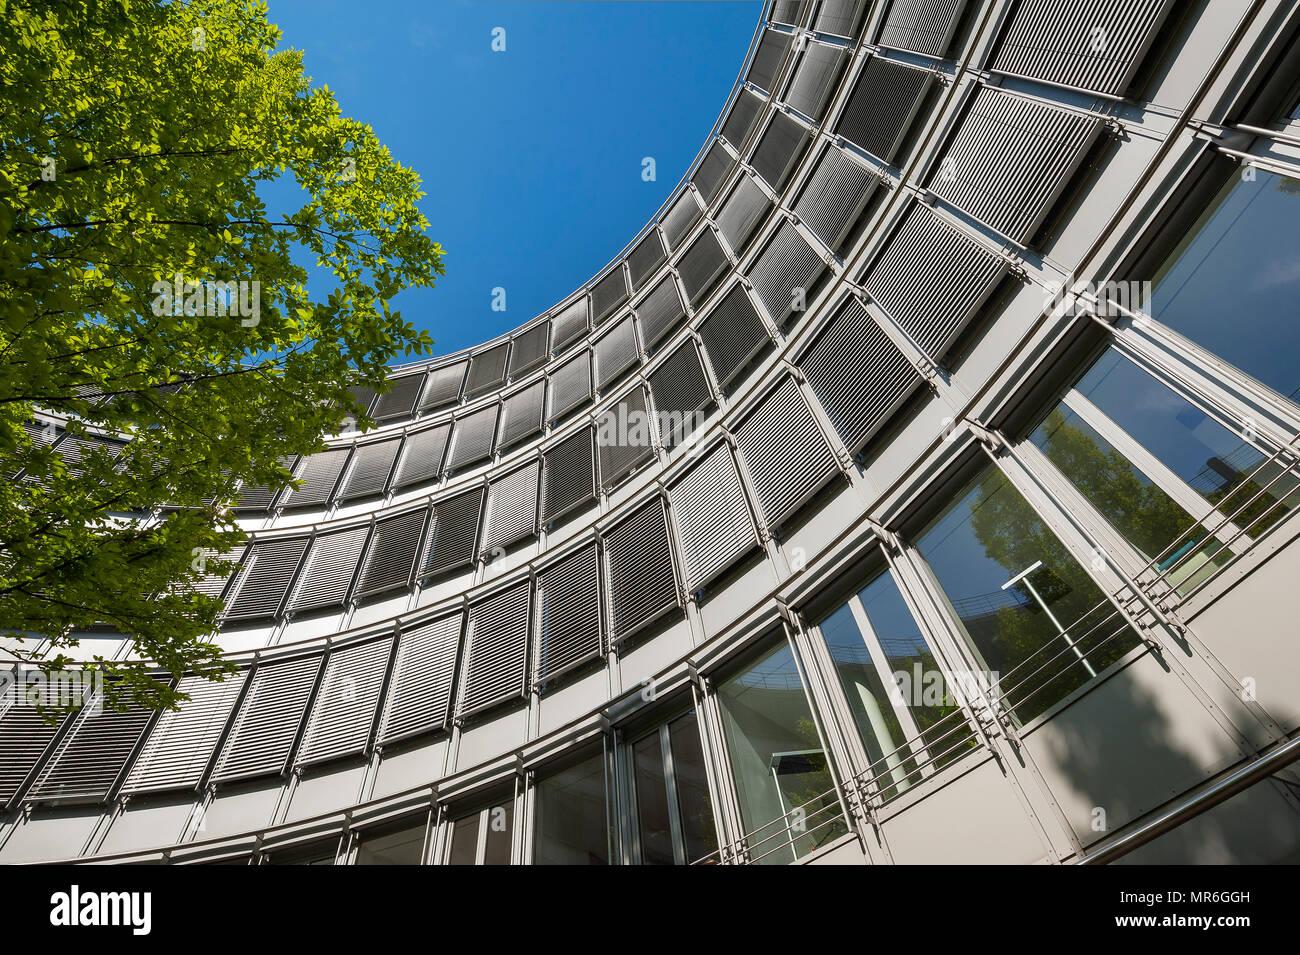 Round facade, office building Thirty Five, Maximilianstraße, Old Town, Lehel, Munich, Upper Bavaria, Bavaria, Germany - Stock Image